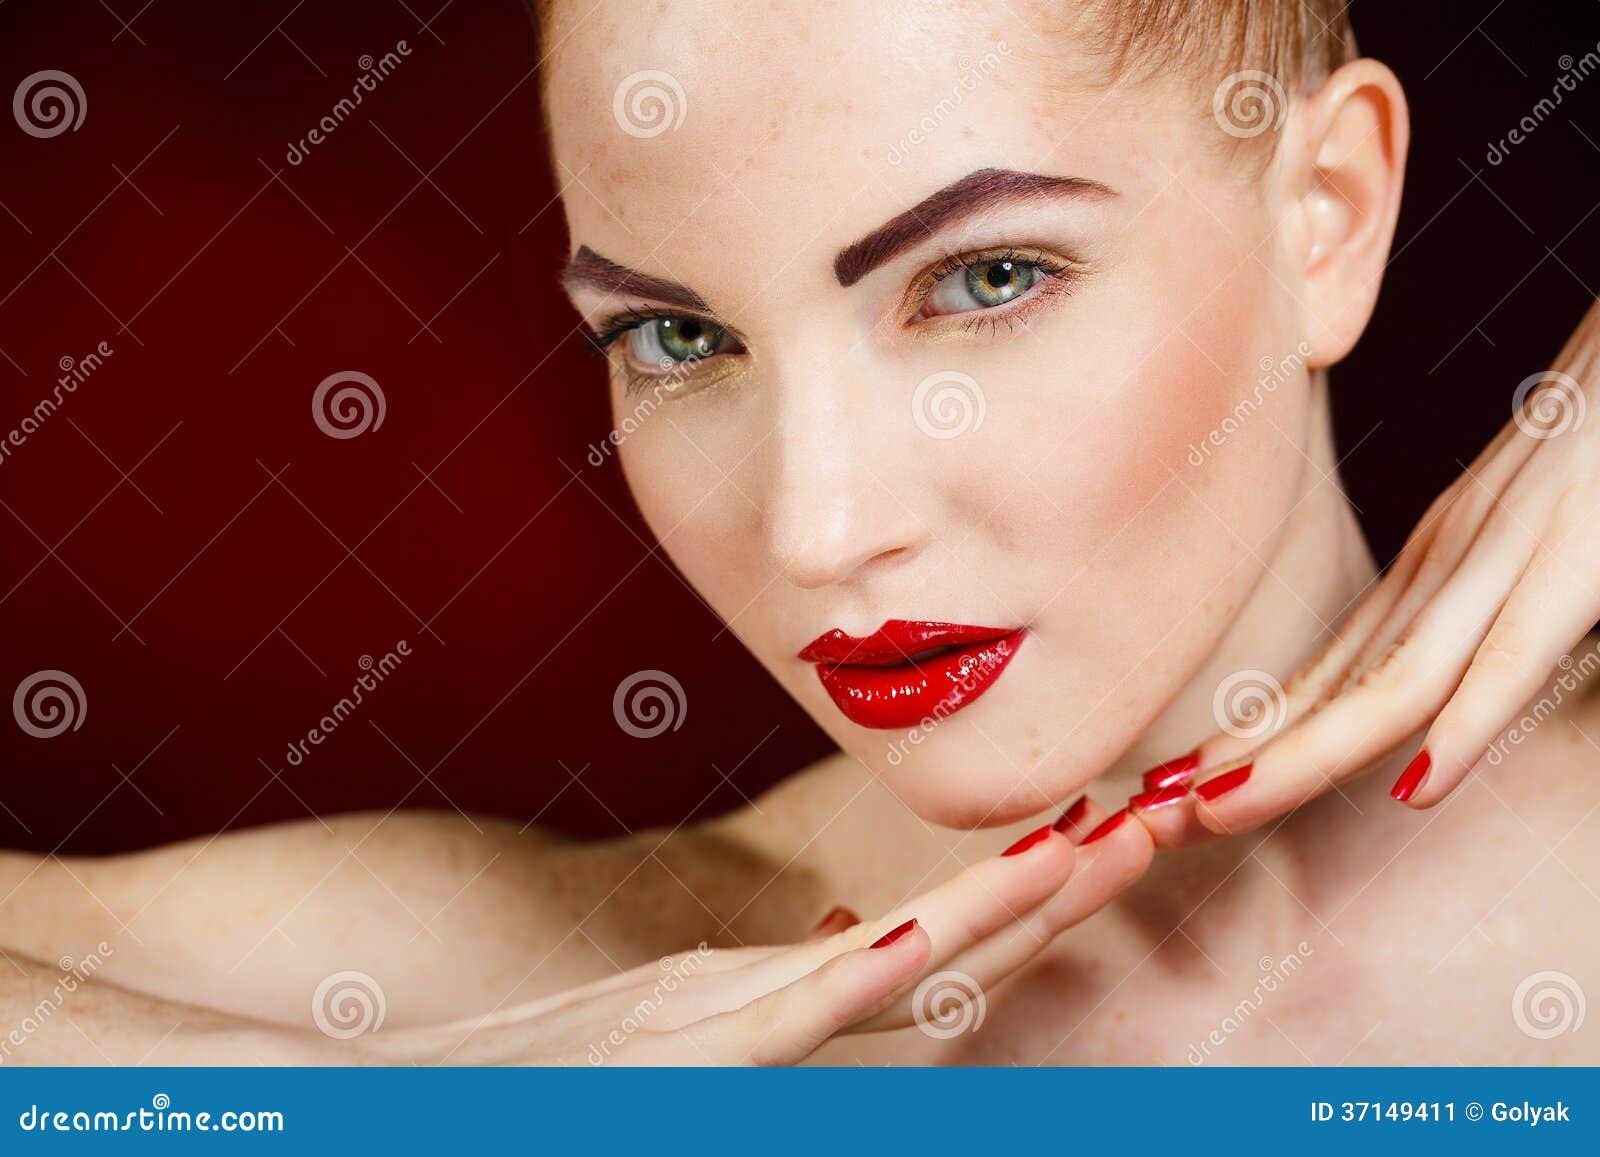 beauty girl face make - photo #40